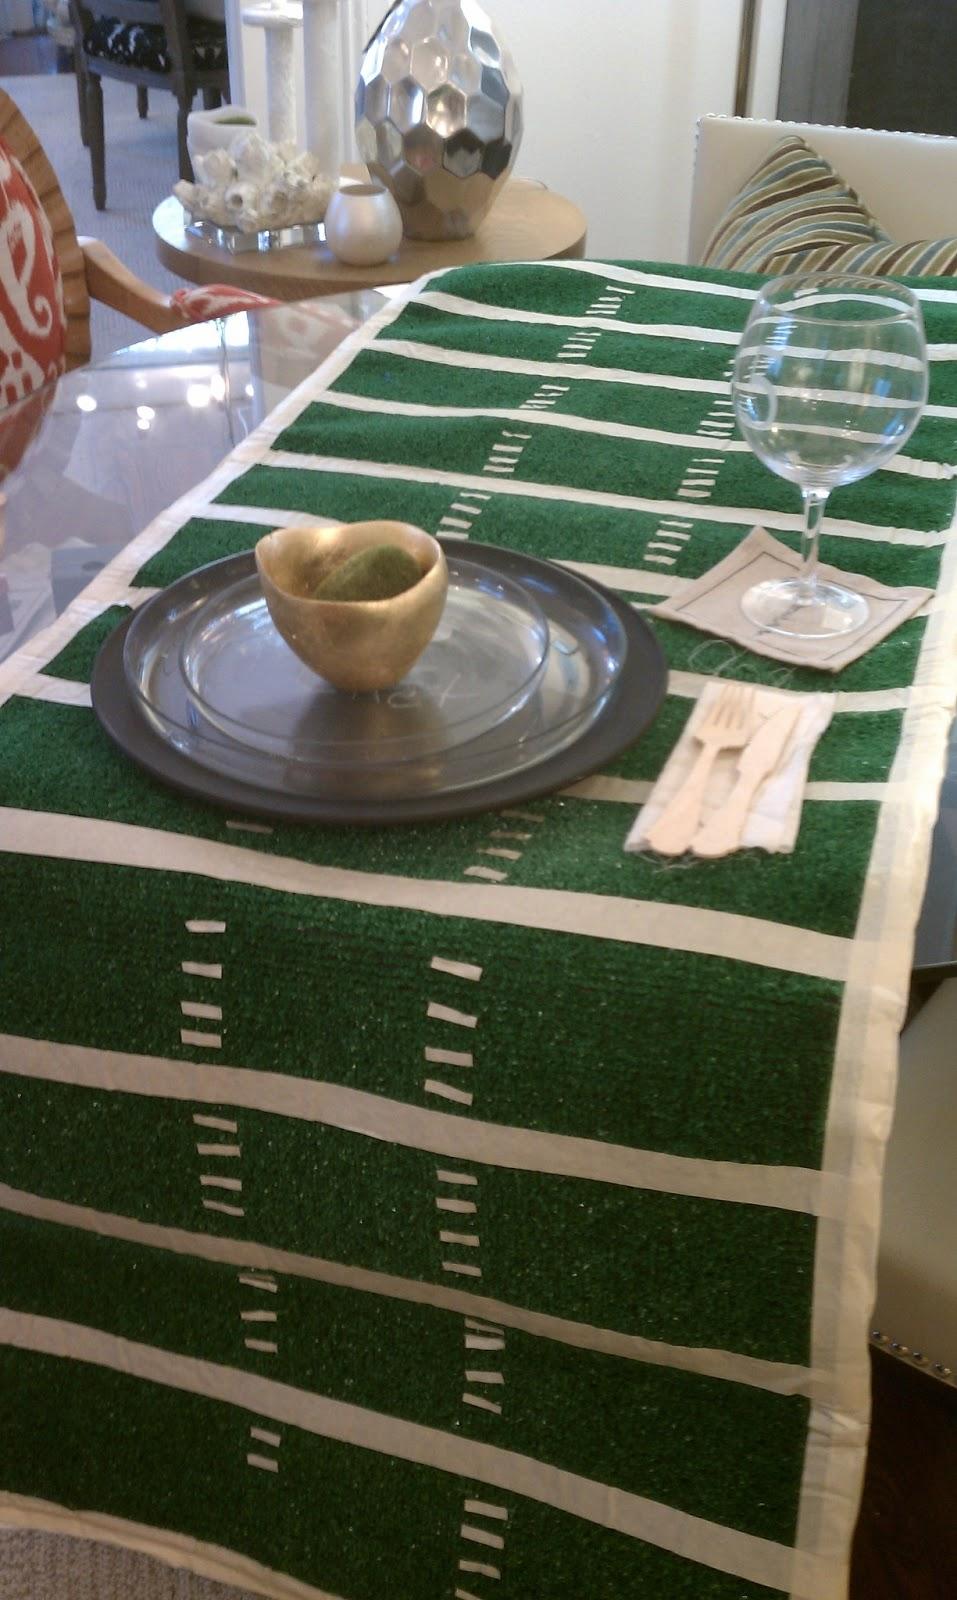 Super Easy Diy Dish Soap 3 Ingredients: Nadia's DIY Projects: Easy DIY Super Bowl Football Field